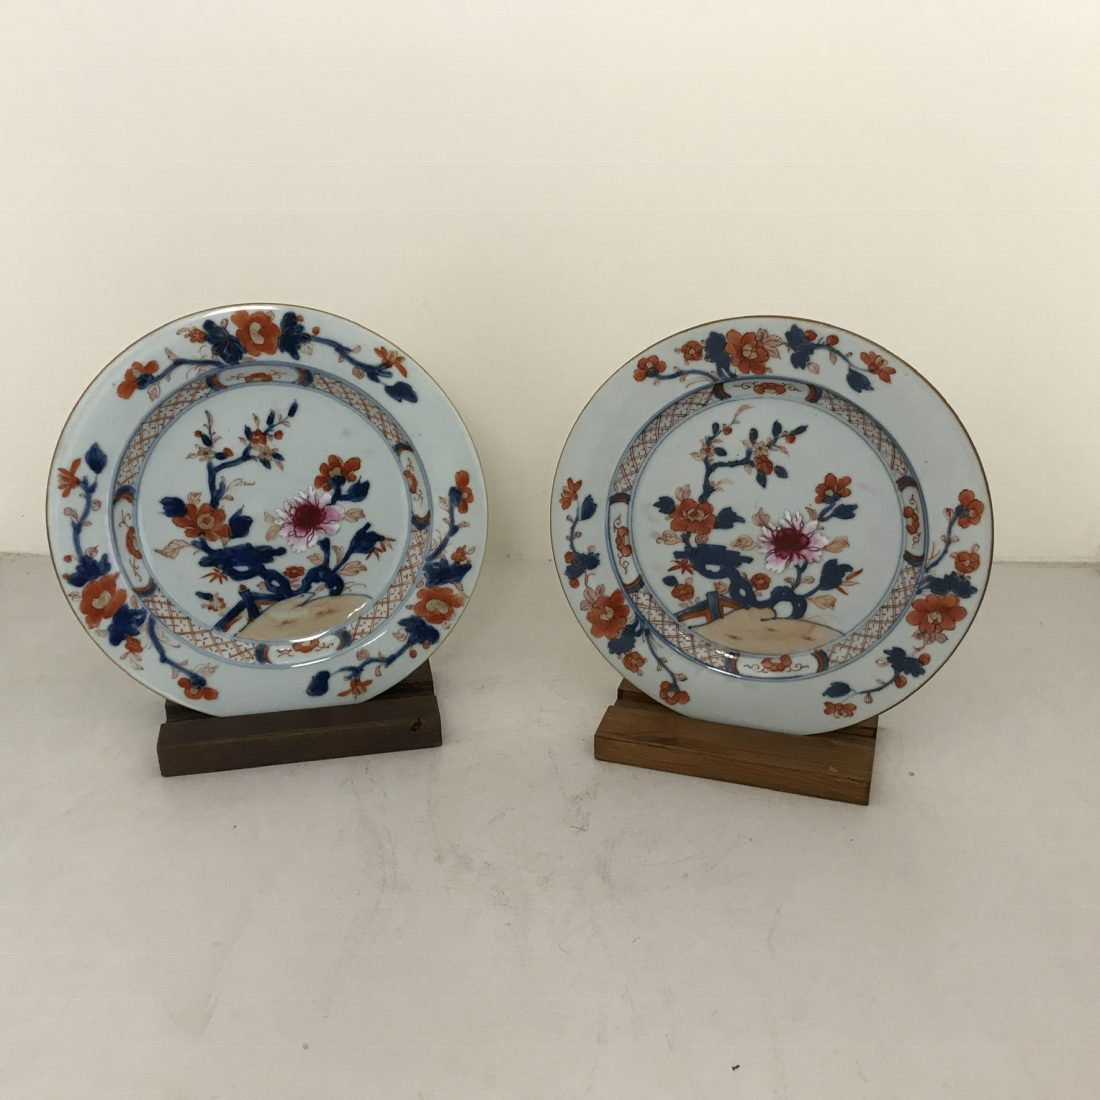 Twee Imari porseleinen borden, China, 18e eeuw